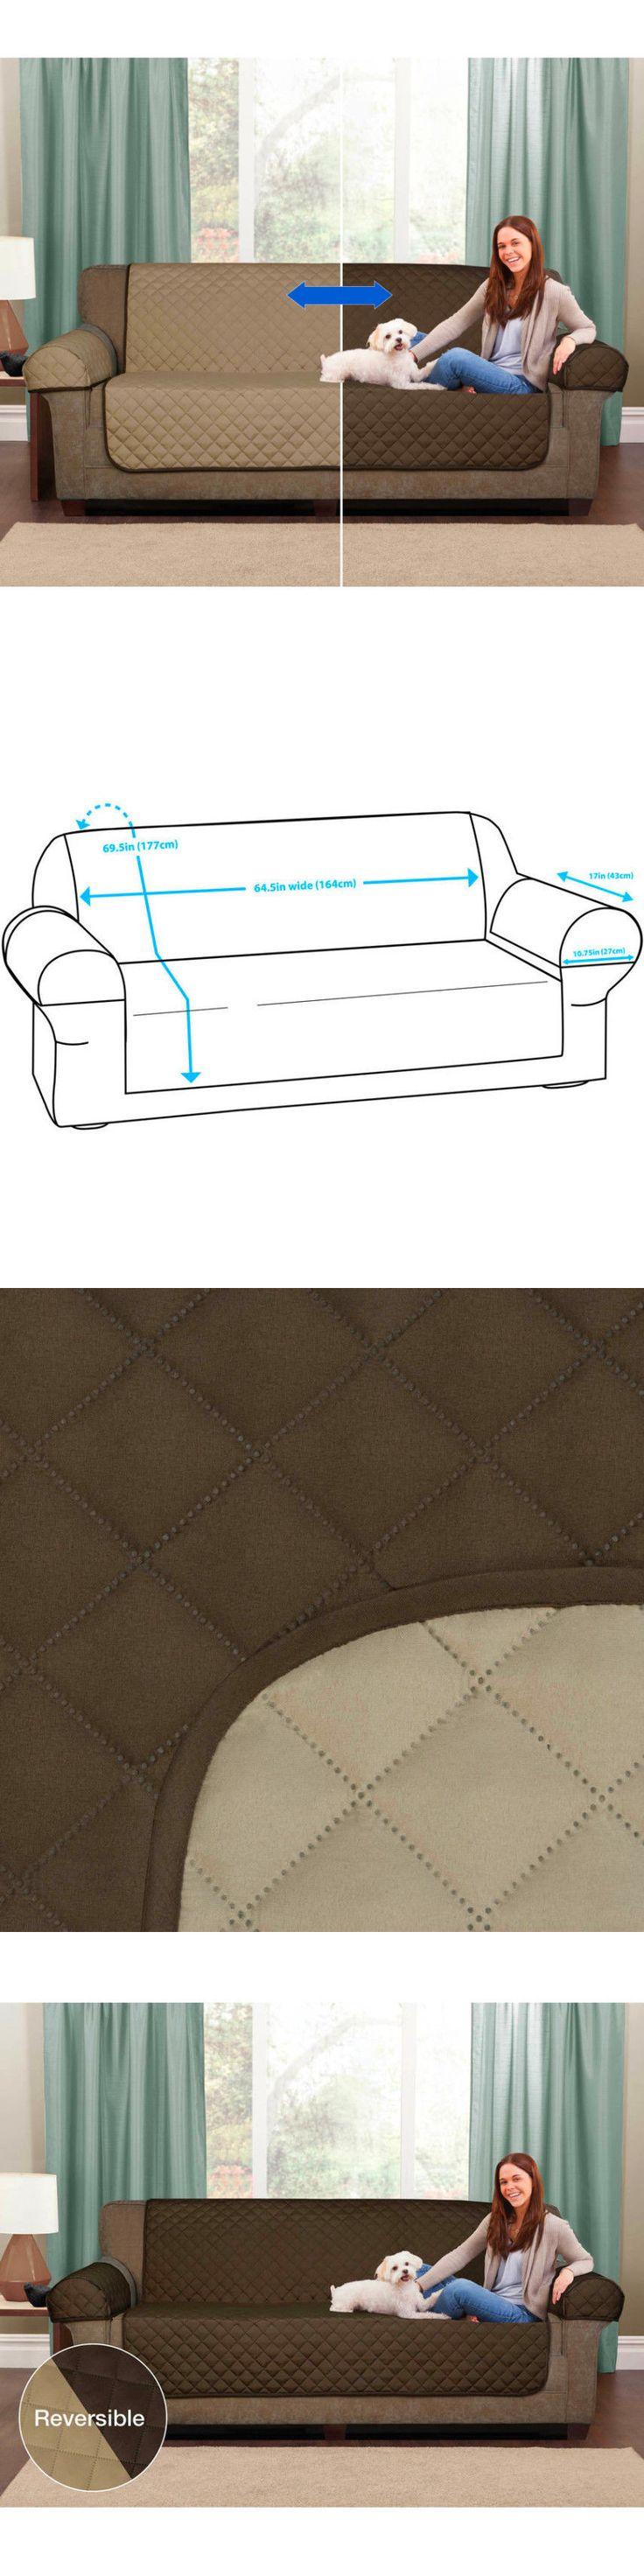 Sofa Covers Pet Protection Tar Sofa Cover Futons At Tar